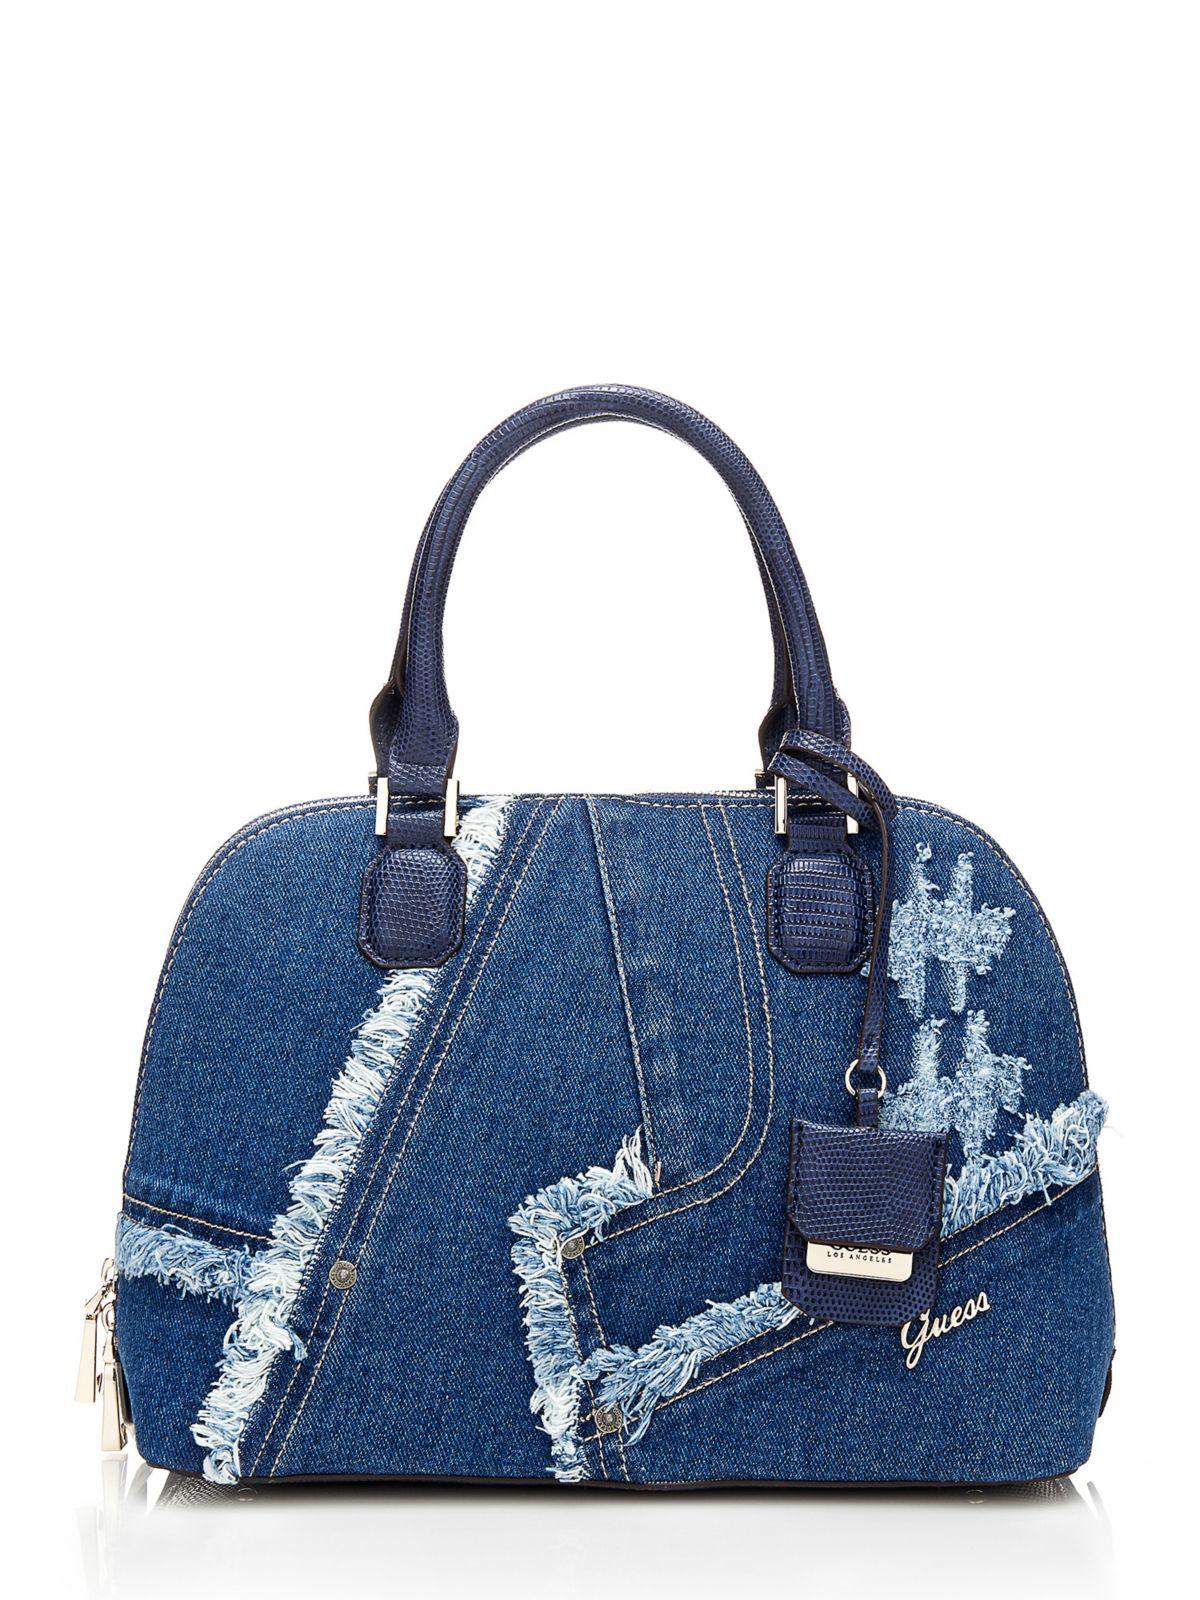 Guess Dani Jeans Satchel Bag in Blue | Lyst